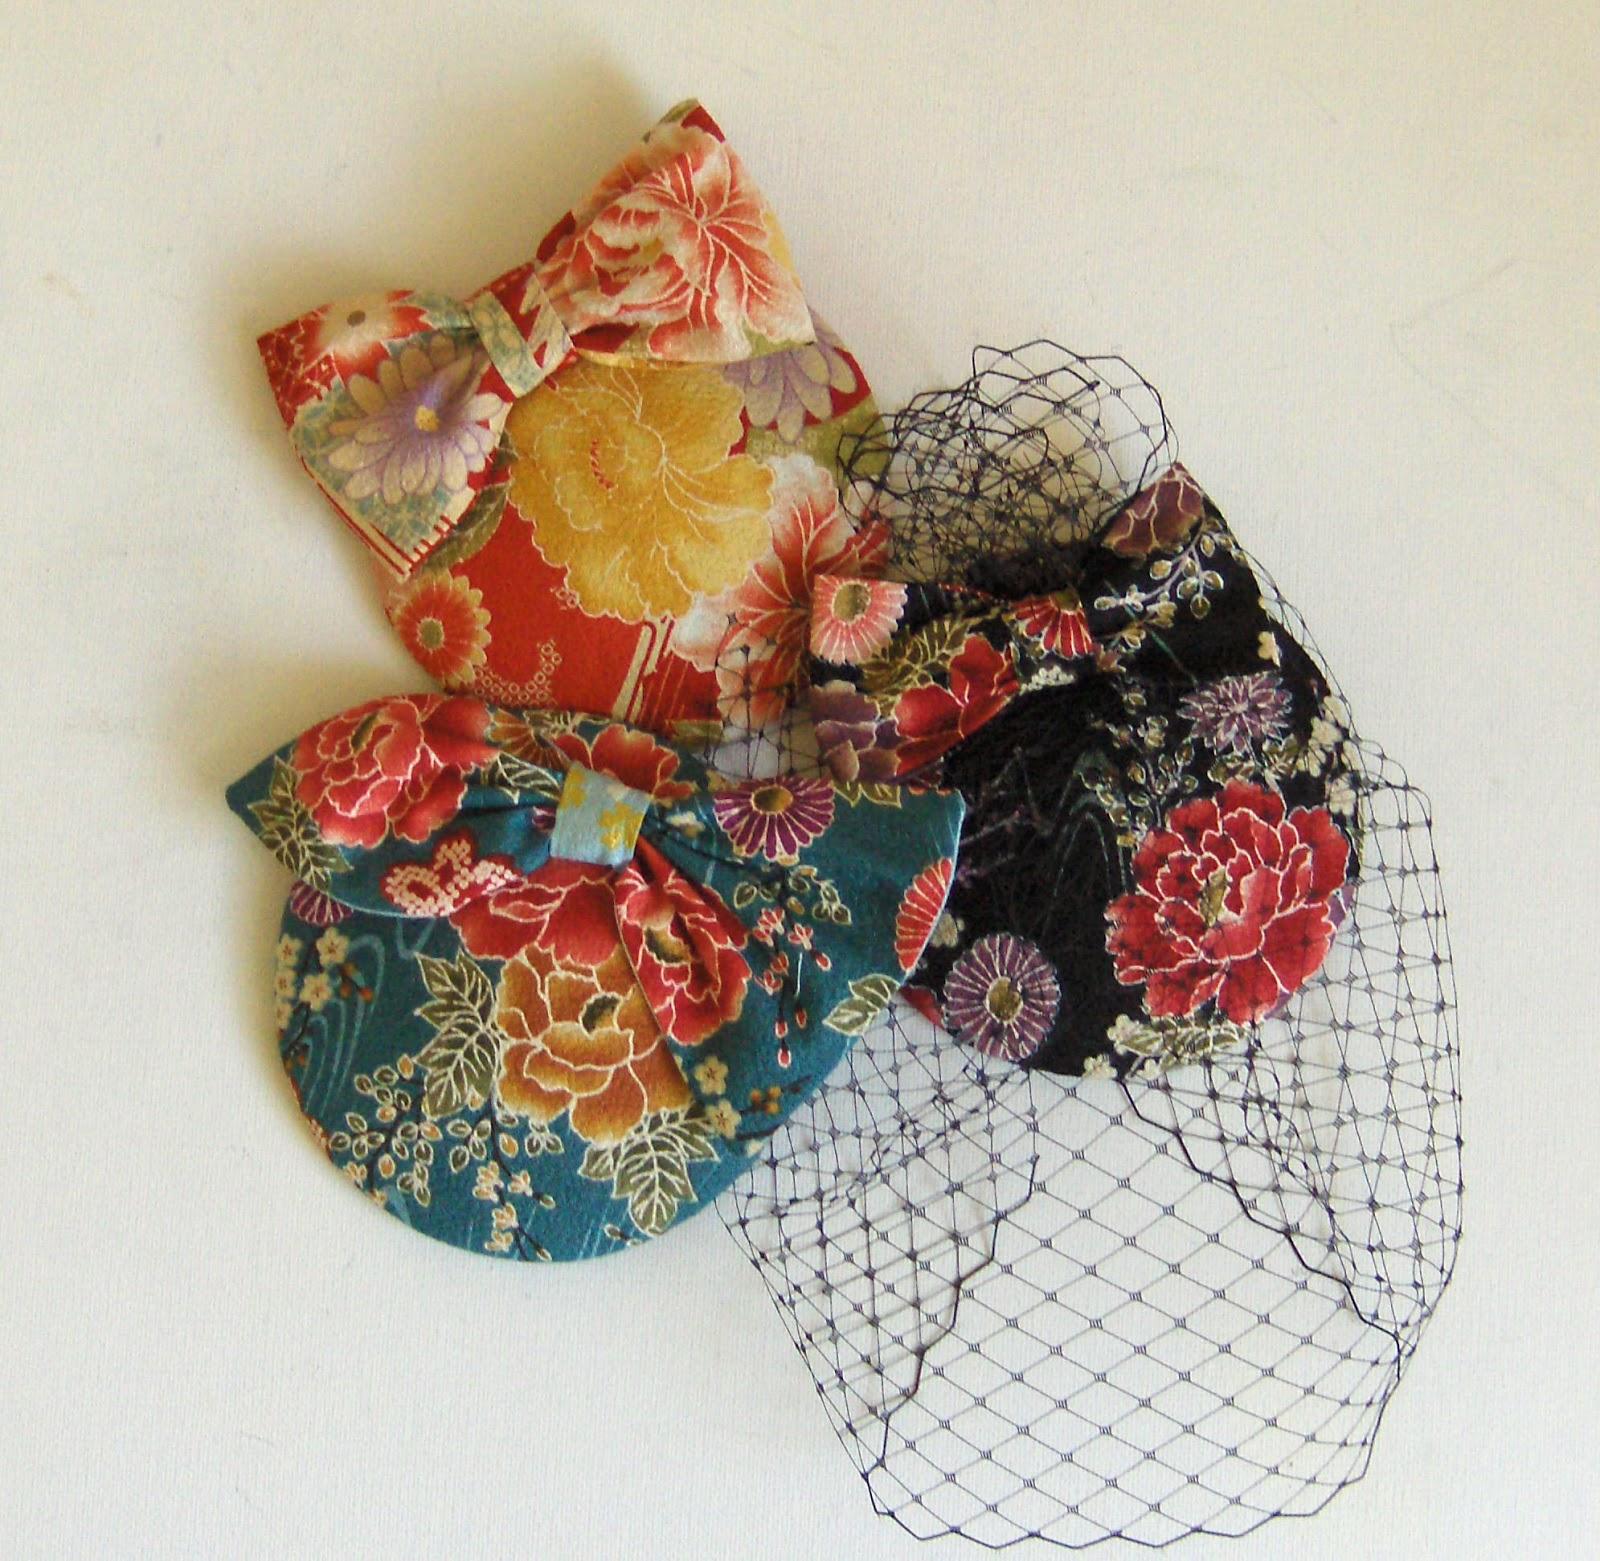 http://folksy.com/items/4415962-Cocktail-hat-gold-sakura-blossoms-